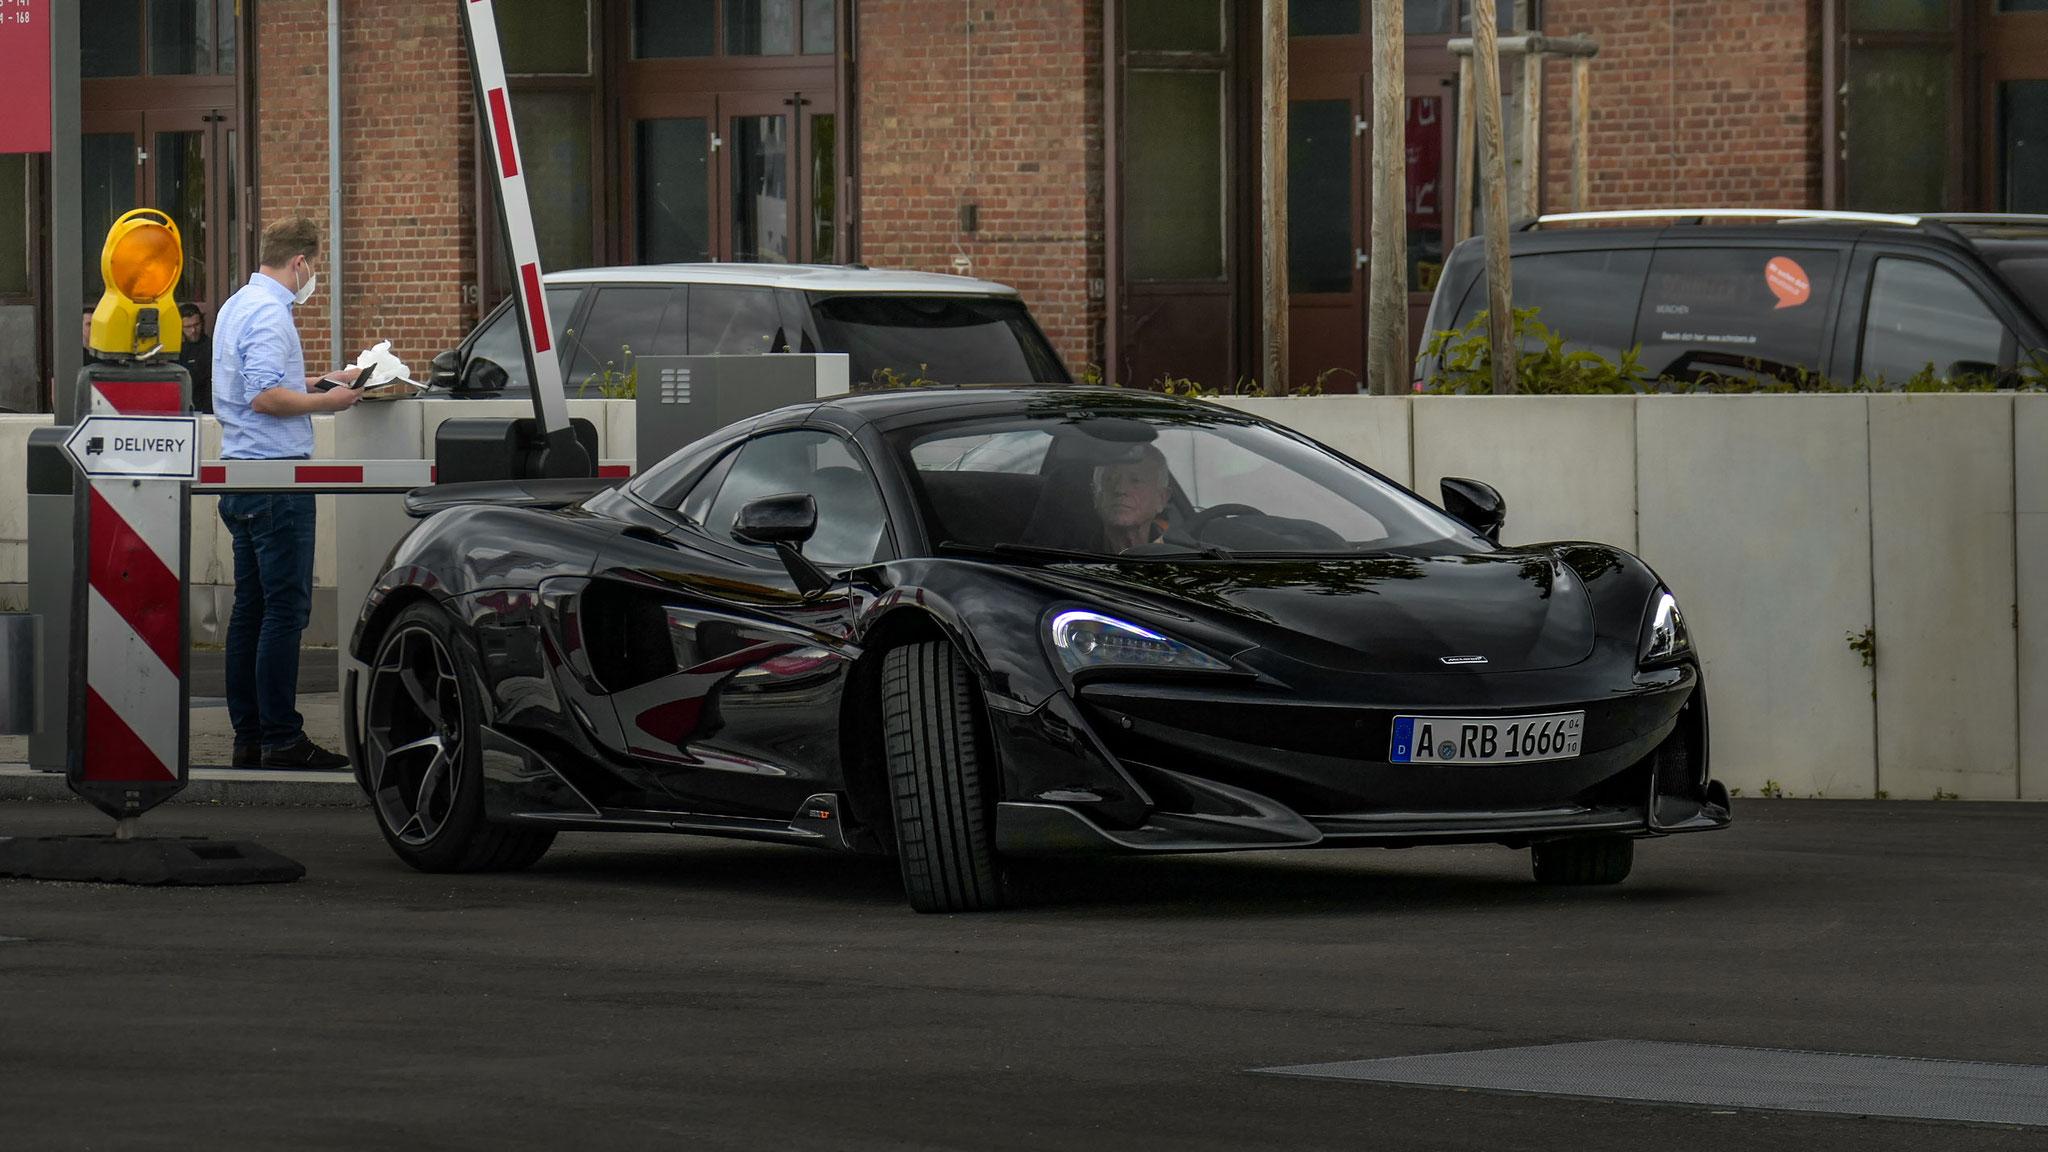 McLaren 600LT Spider - A-RB-1666